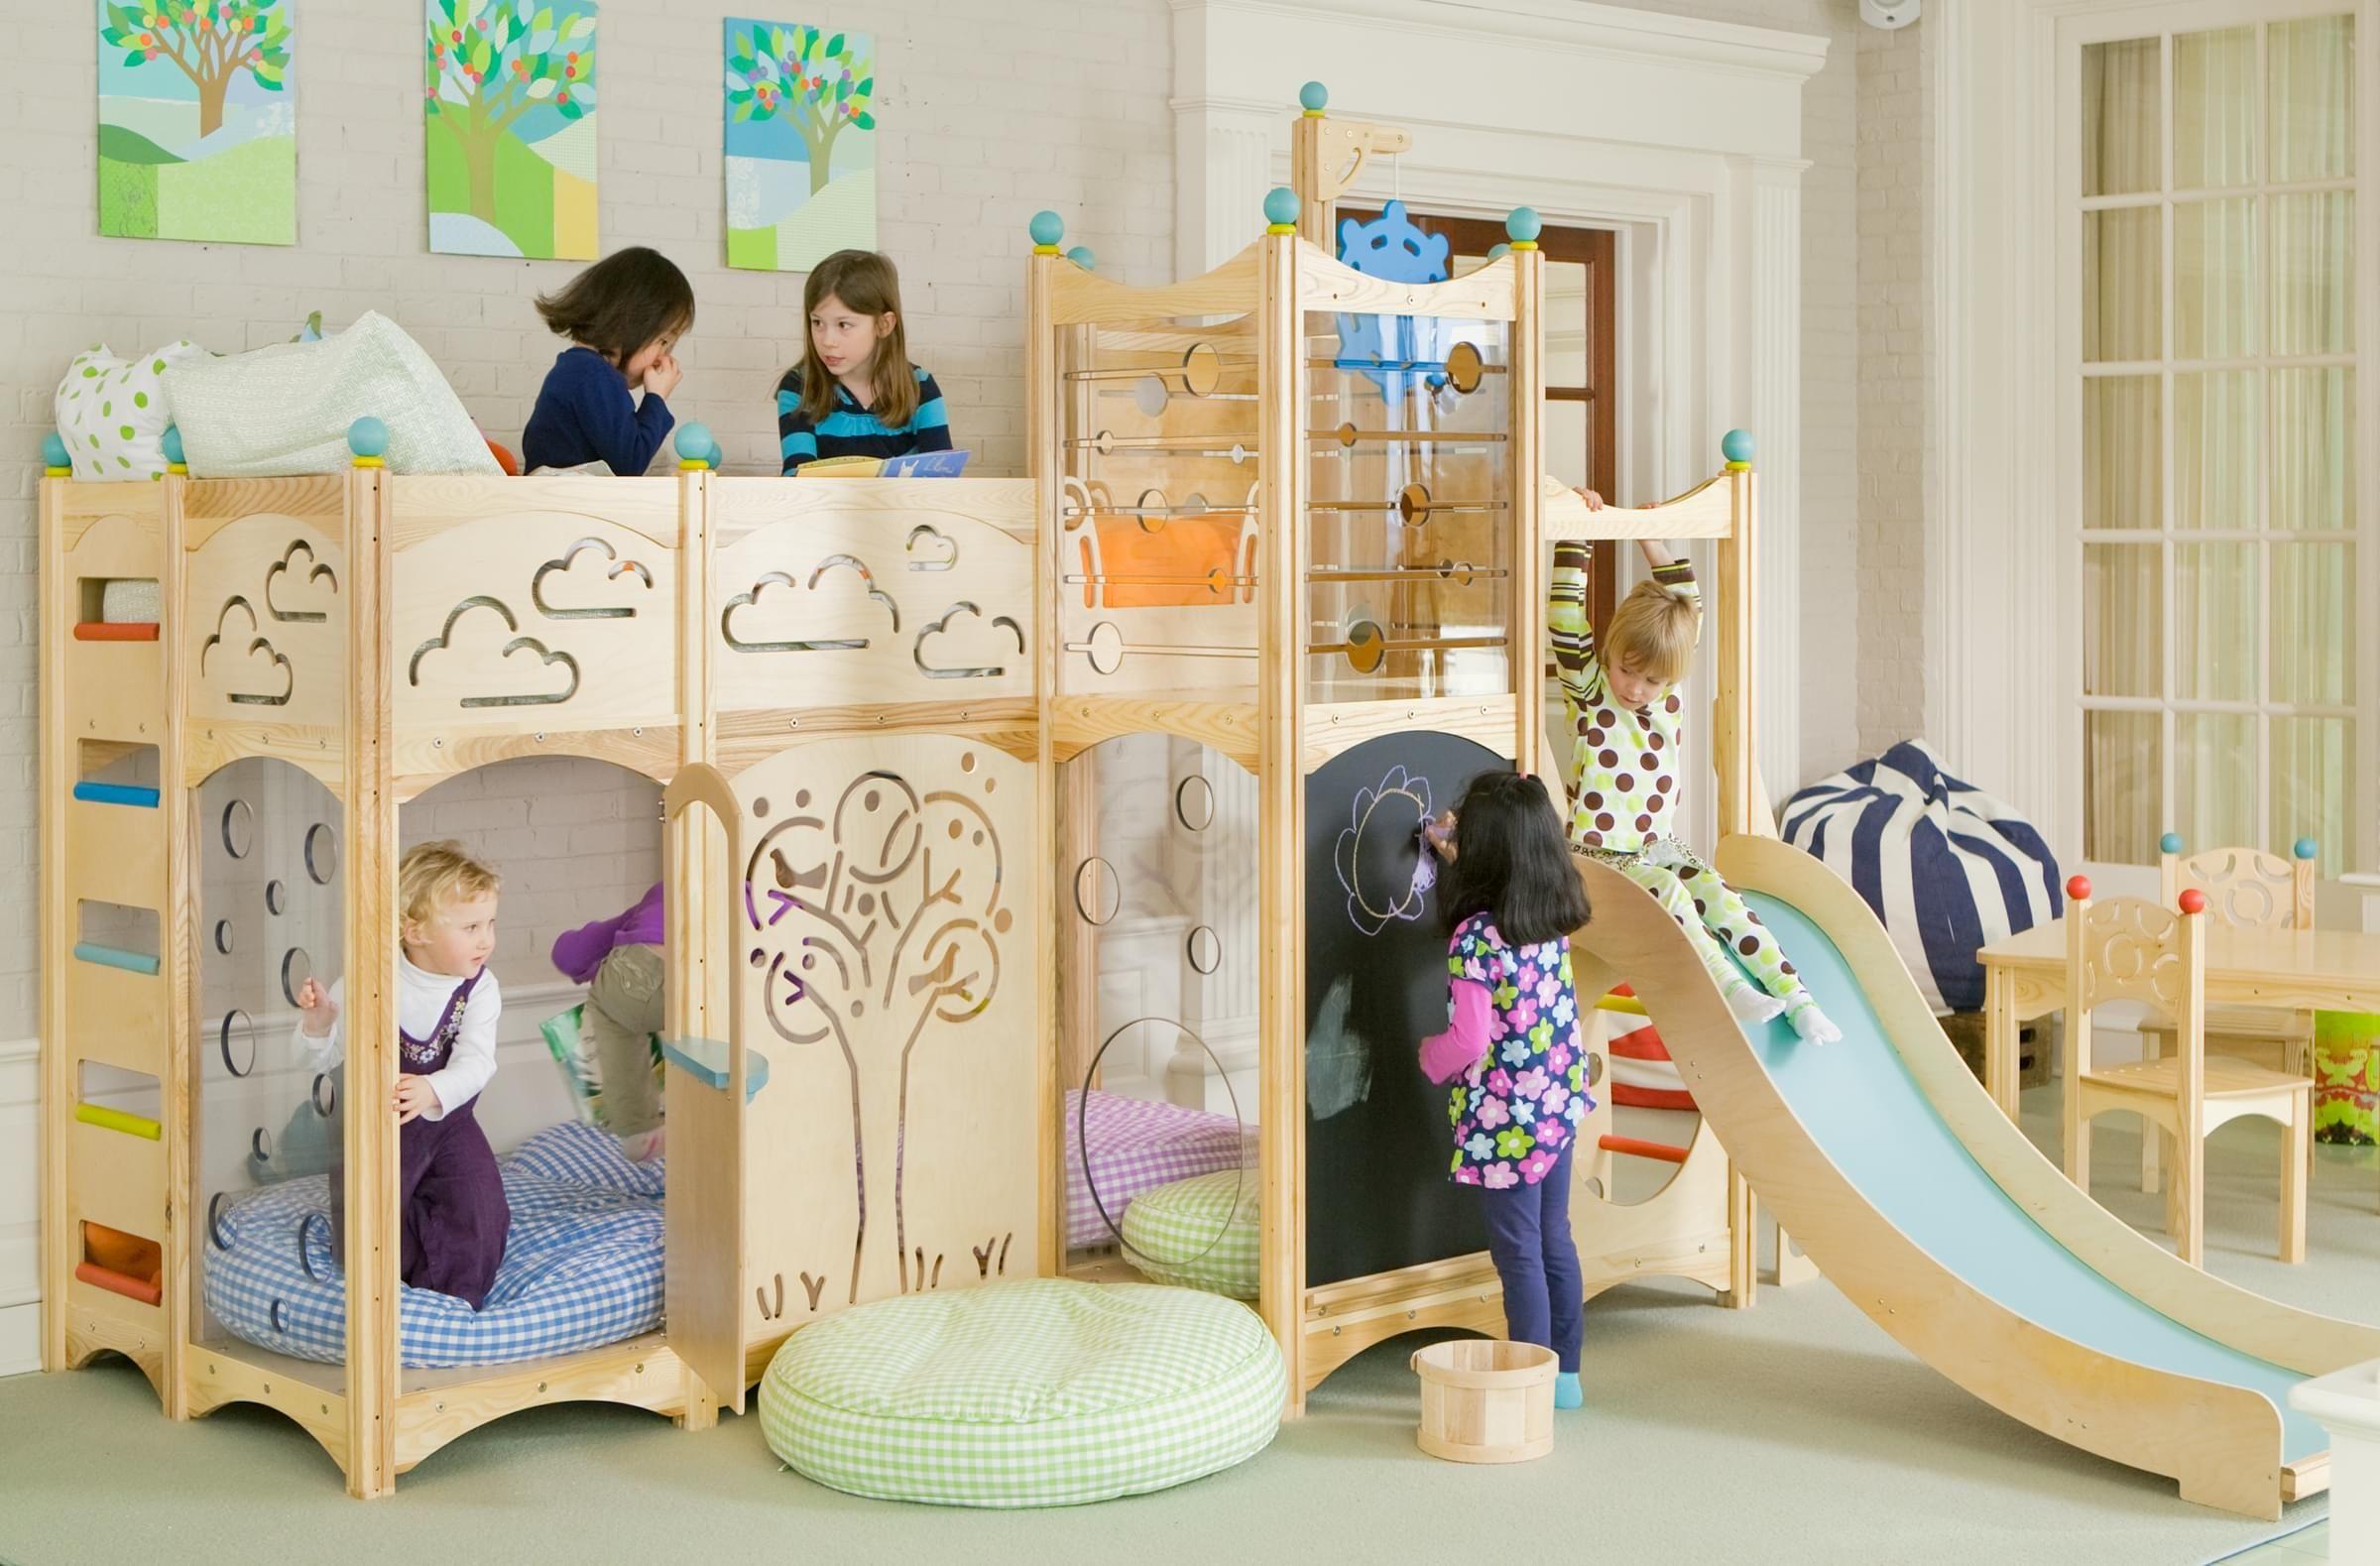 Klettergerüst Innen : Klettergerüst indoor kinderzimmer sprossenwand holz and